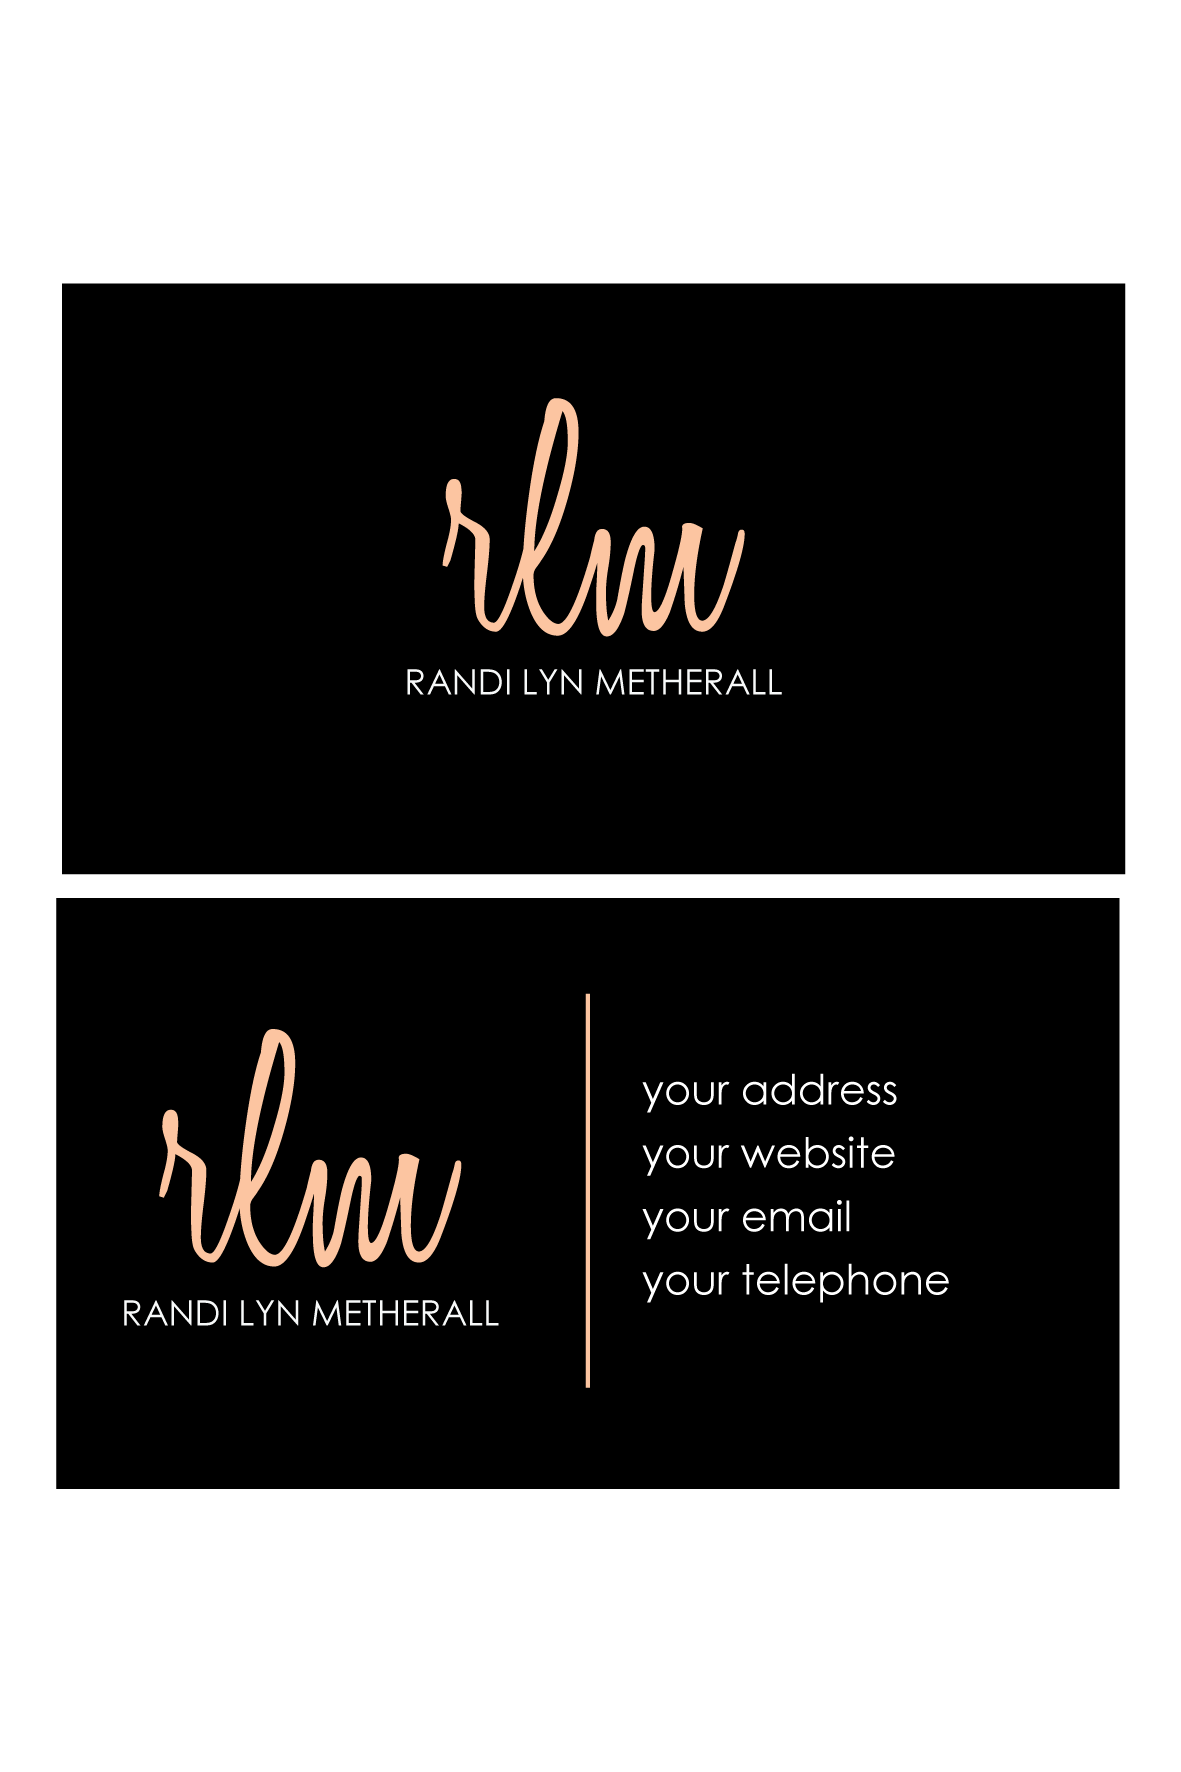 stationery for Randi Lyn Metherall